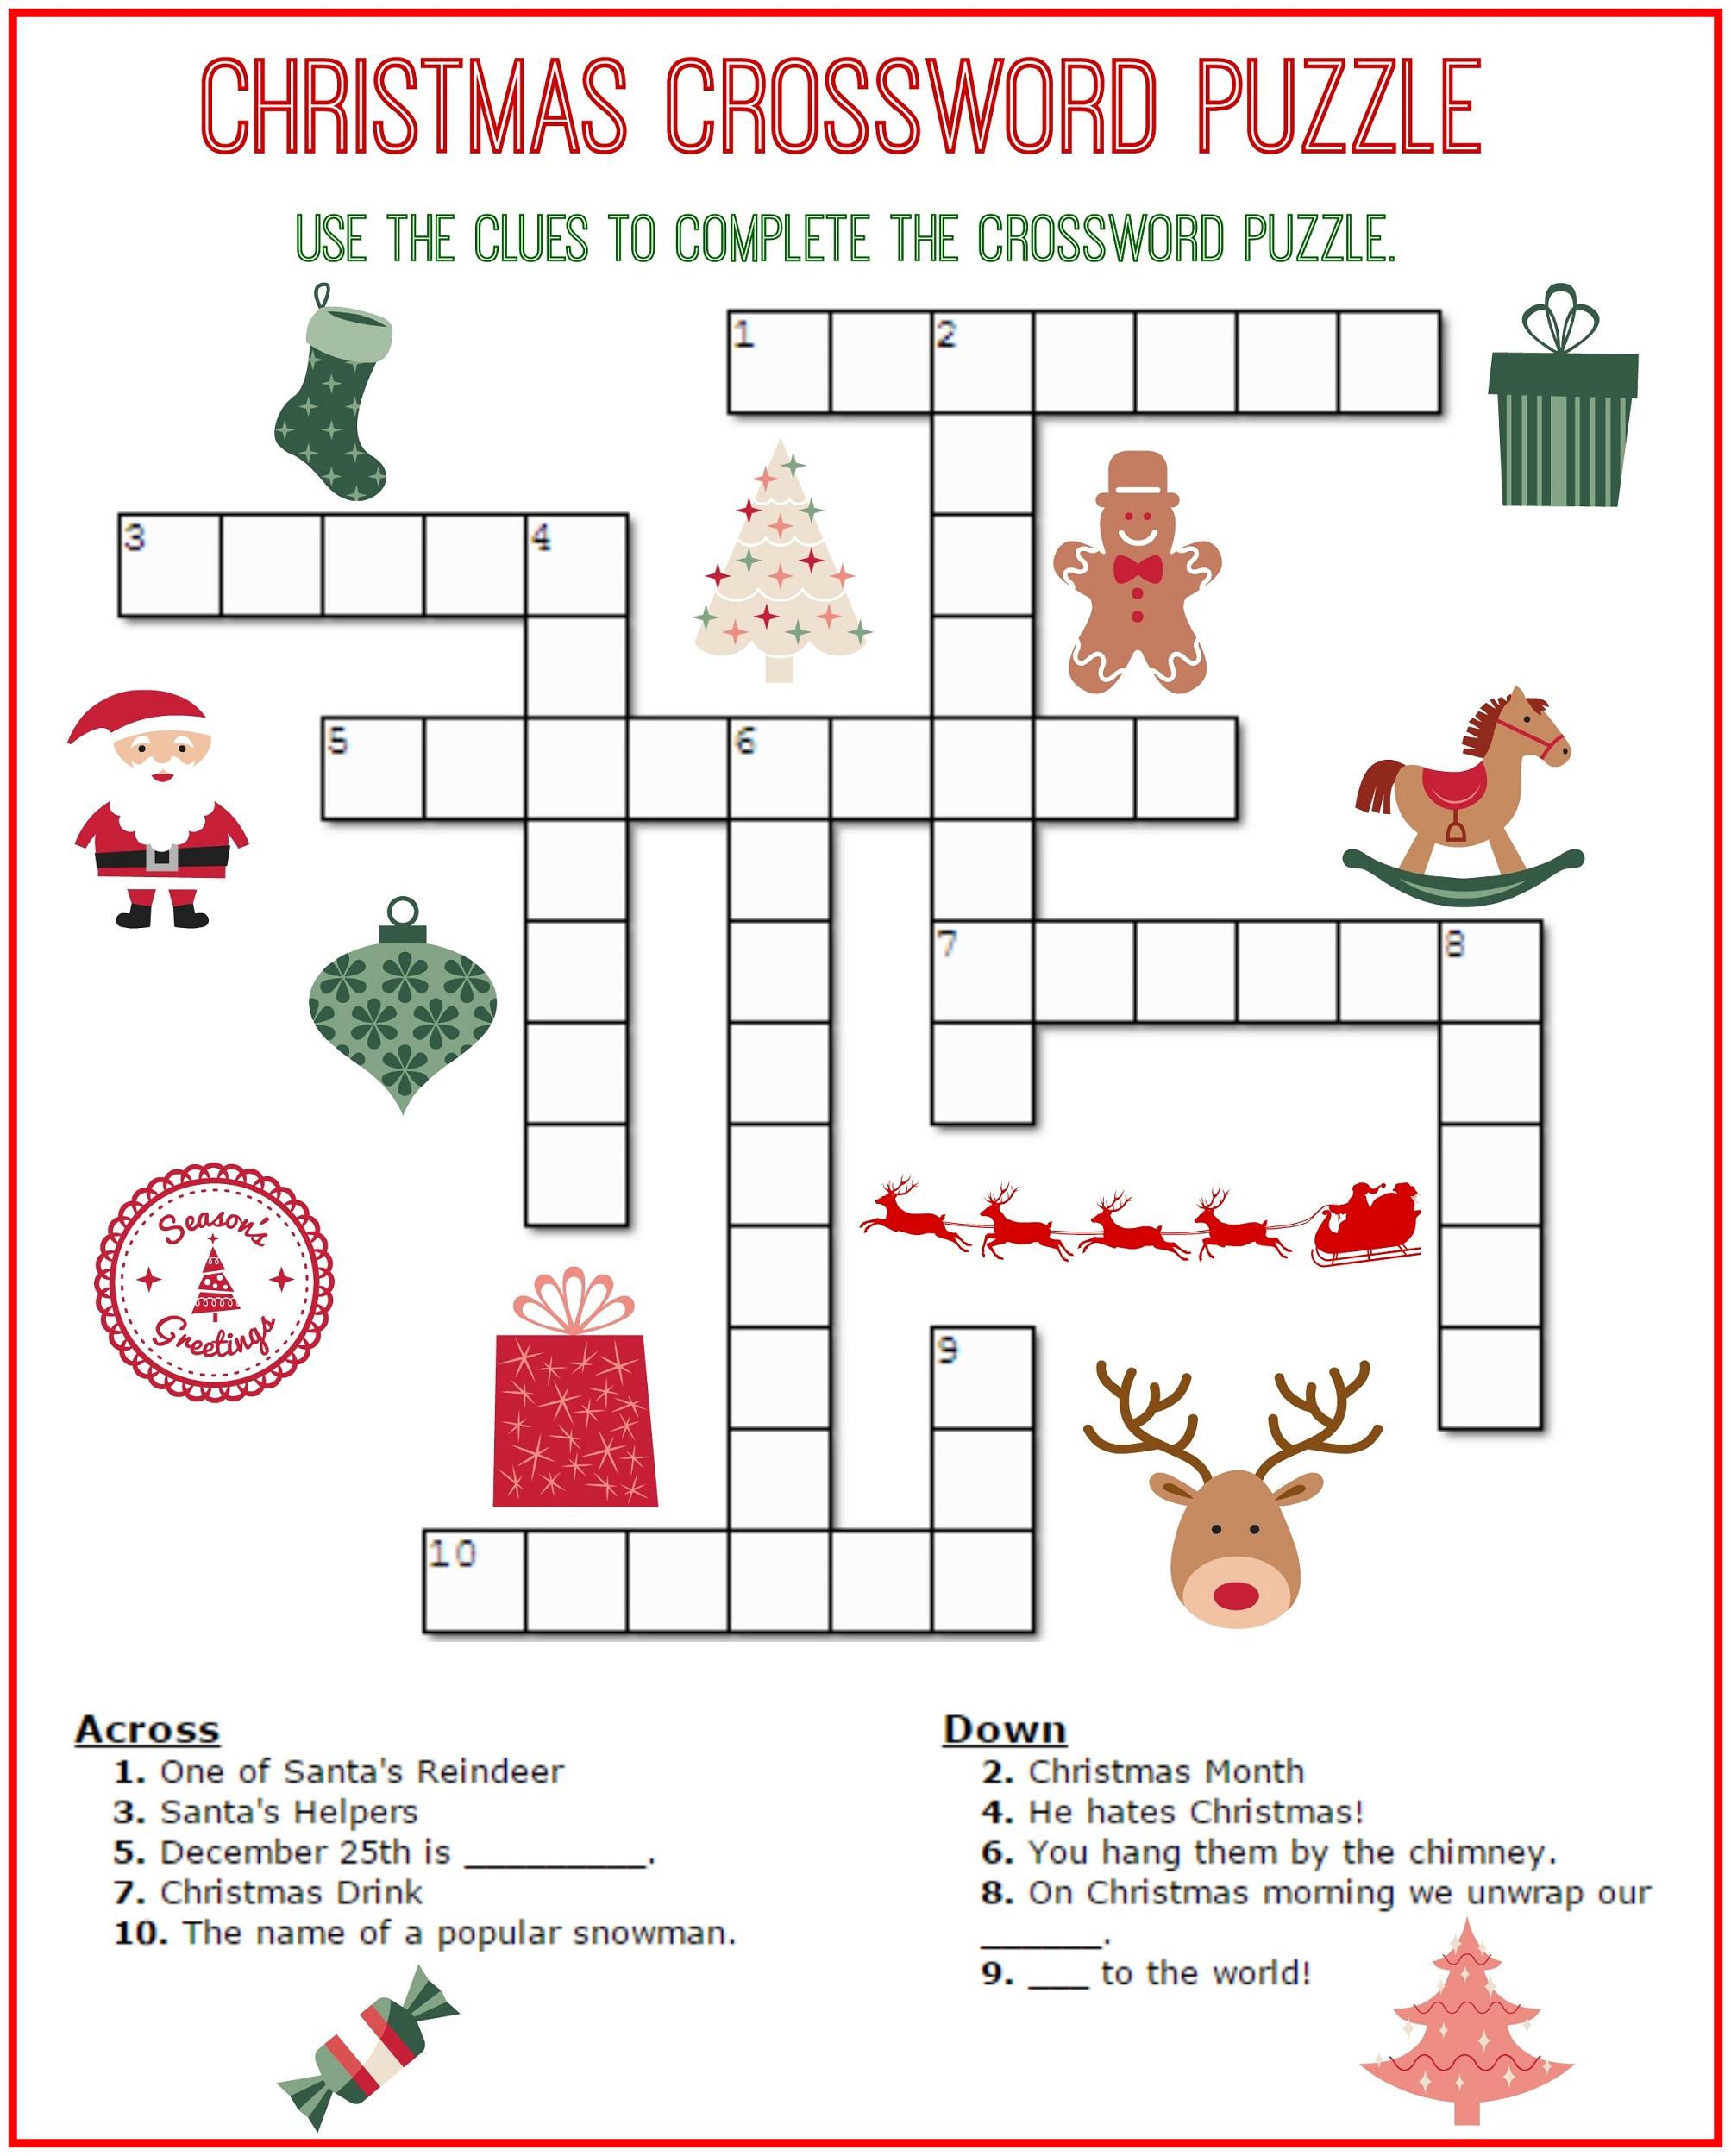 Crossword Puzzle Kids Printable 2017 | Kiddo Shelter - Free Easy - Printable Crossword Puzzles For Preschoolers